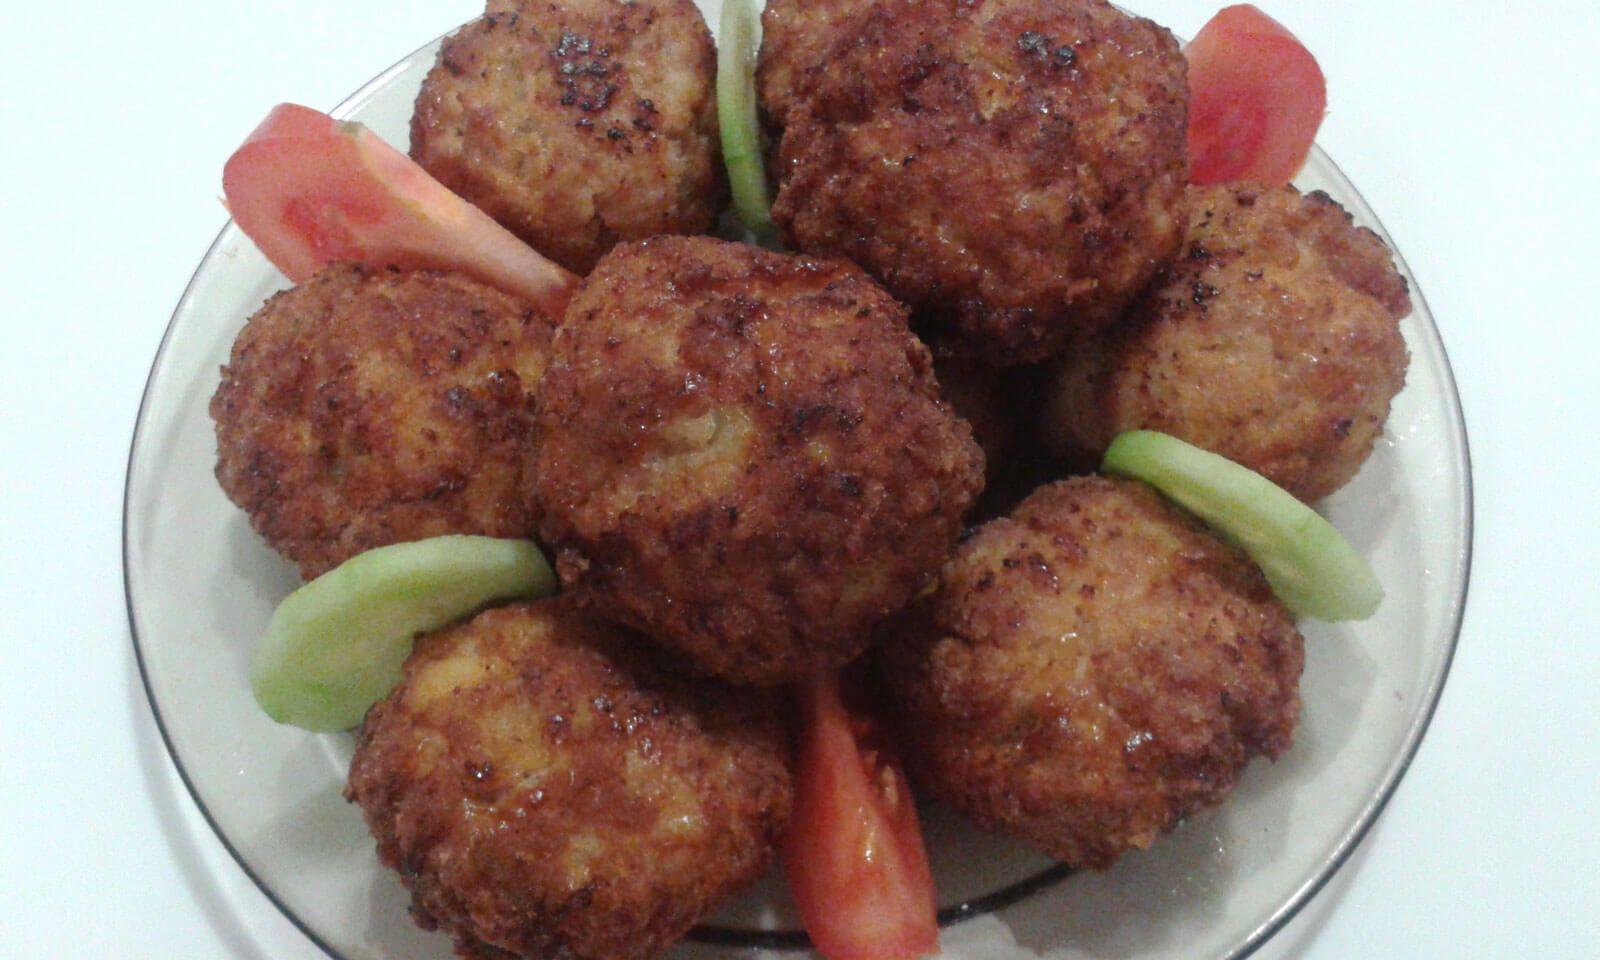 Gluten and egg free meatballs egg free sugar free